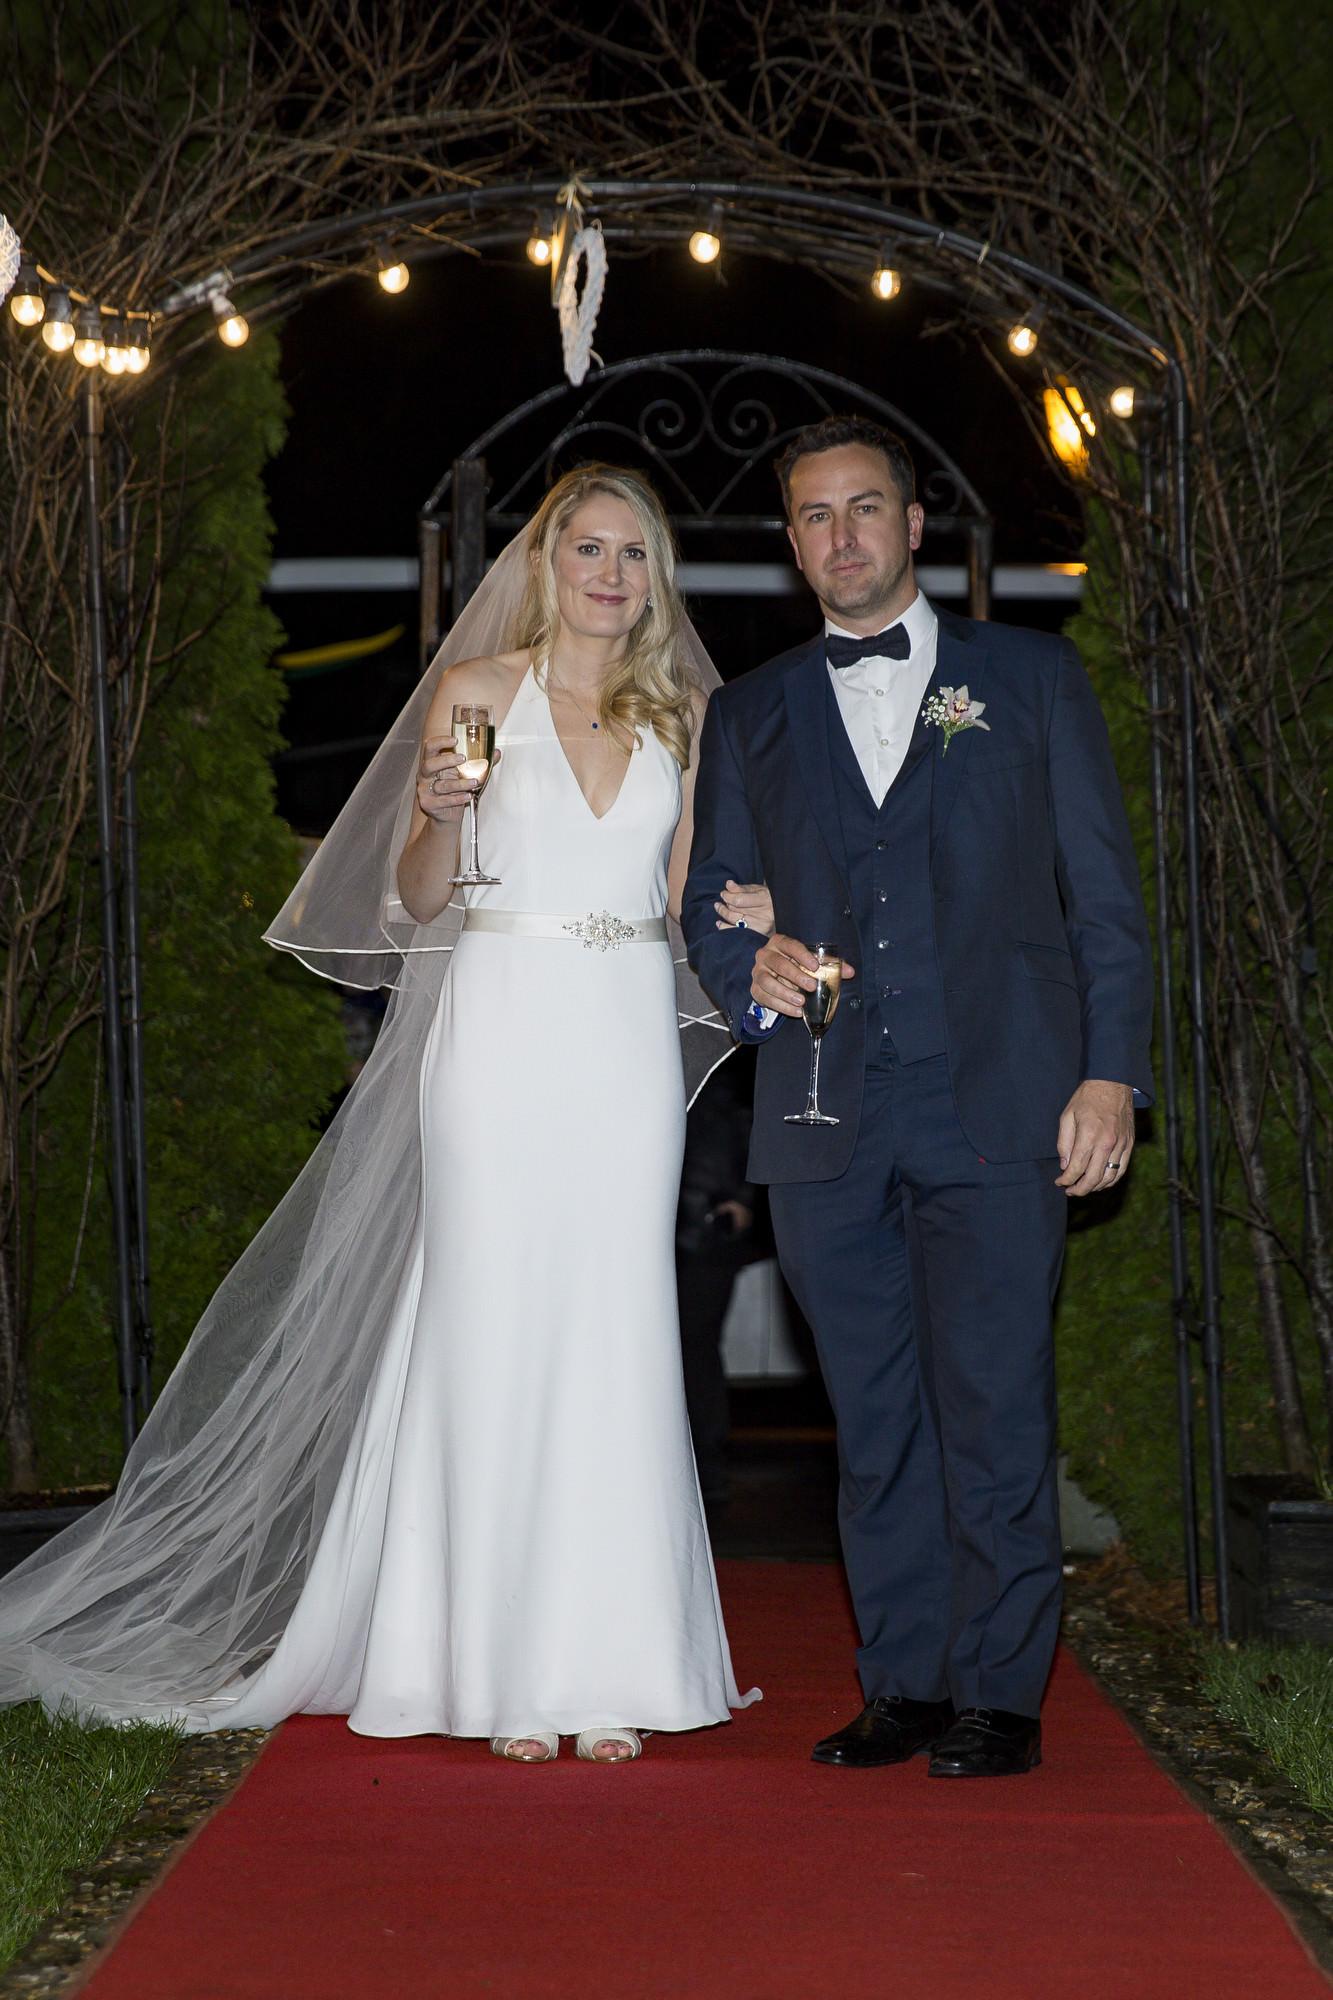 muckross_park_hotel_grougane_barra_wedding_photographer_goldenmoments_063.jpg